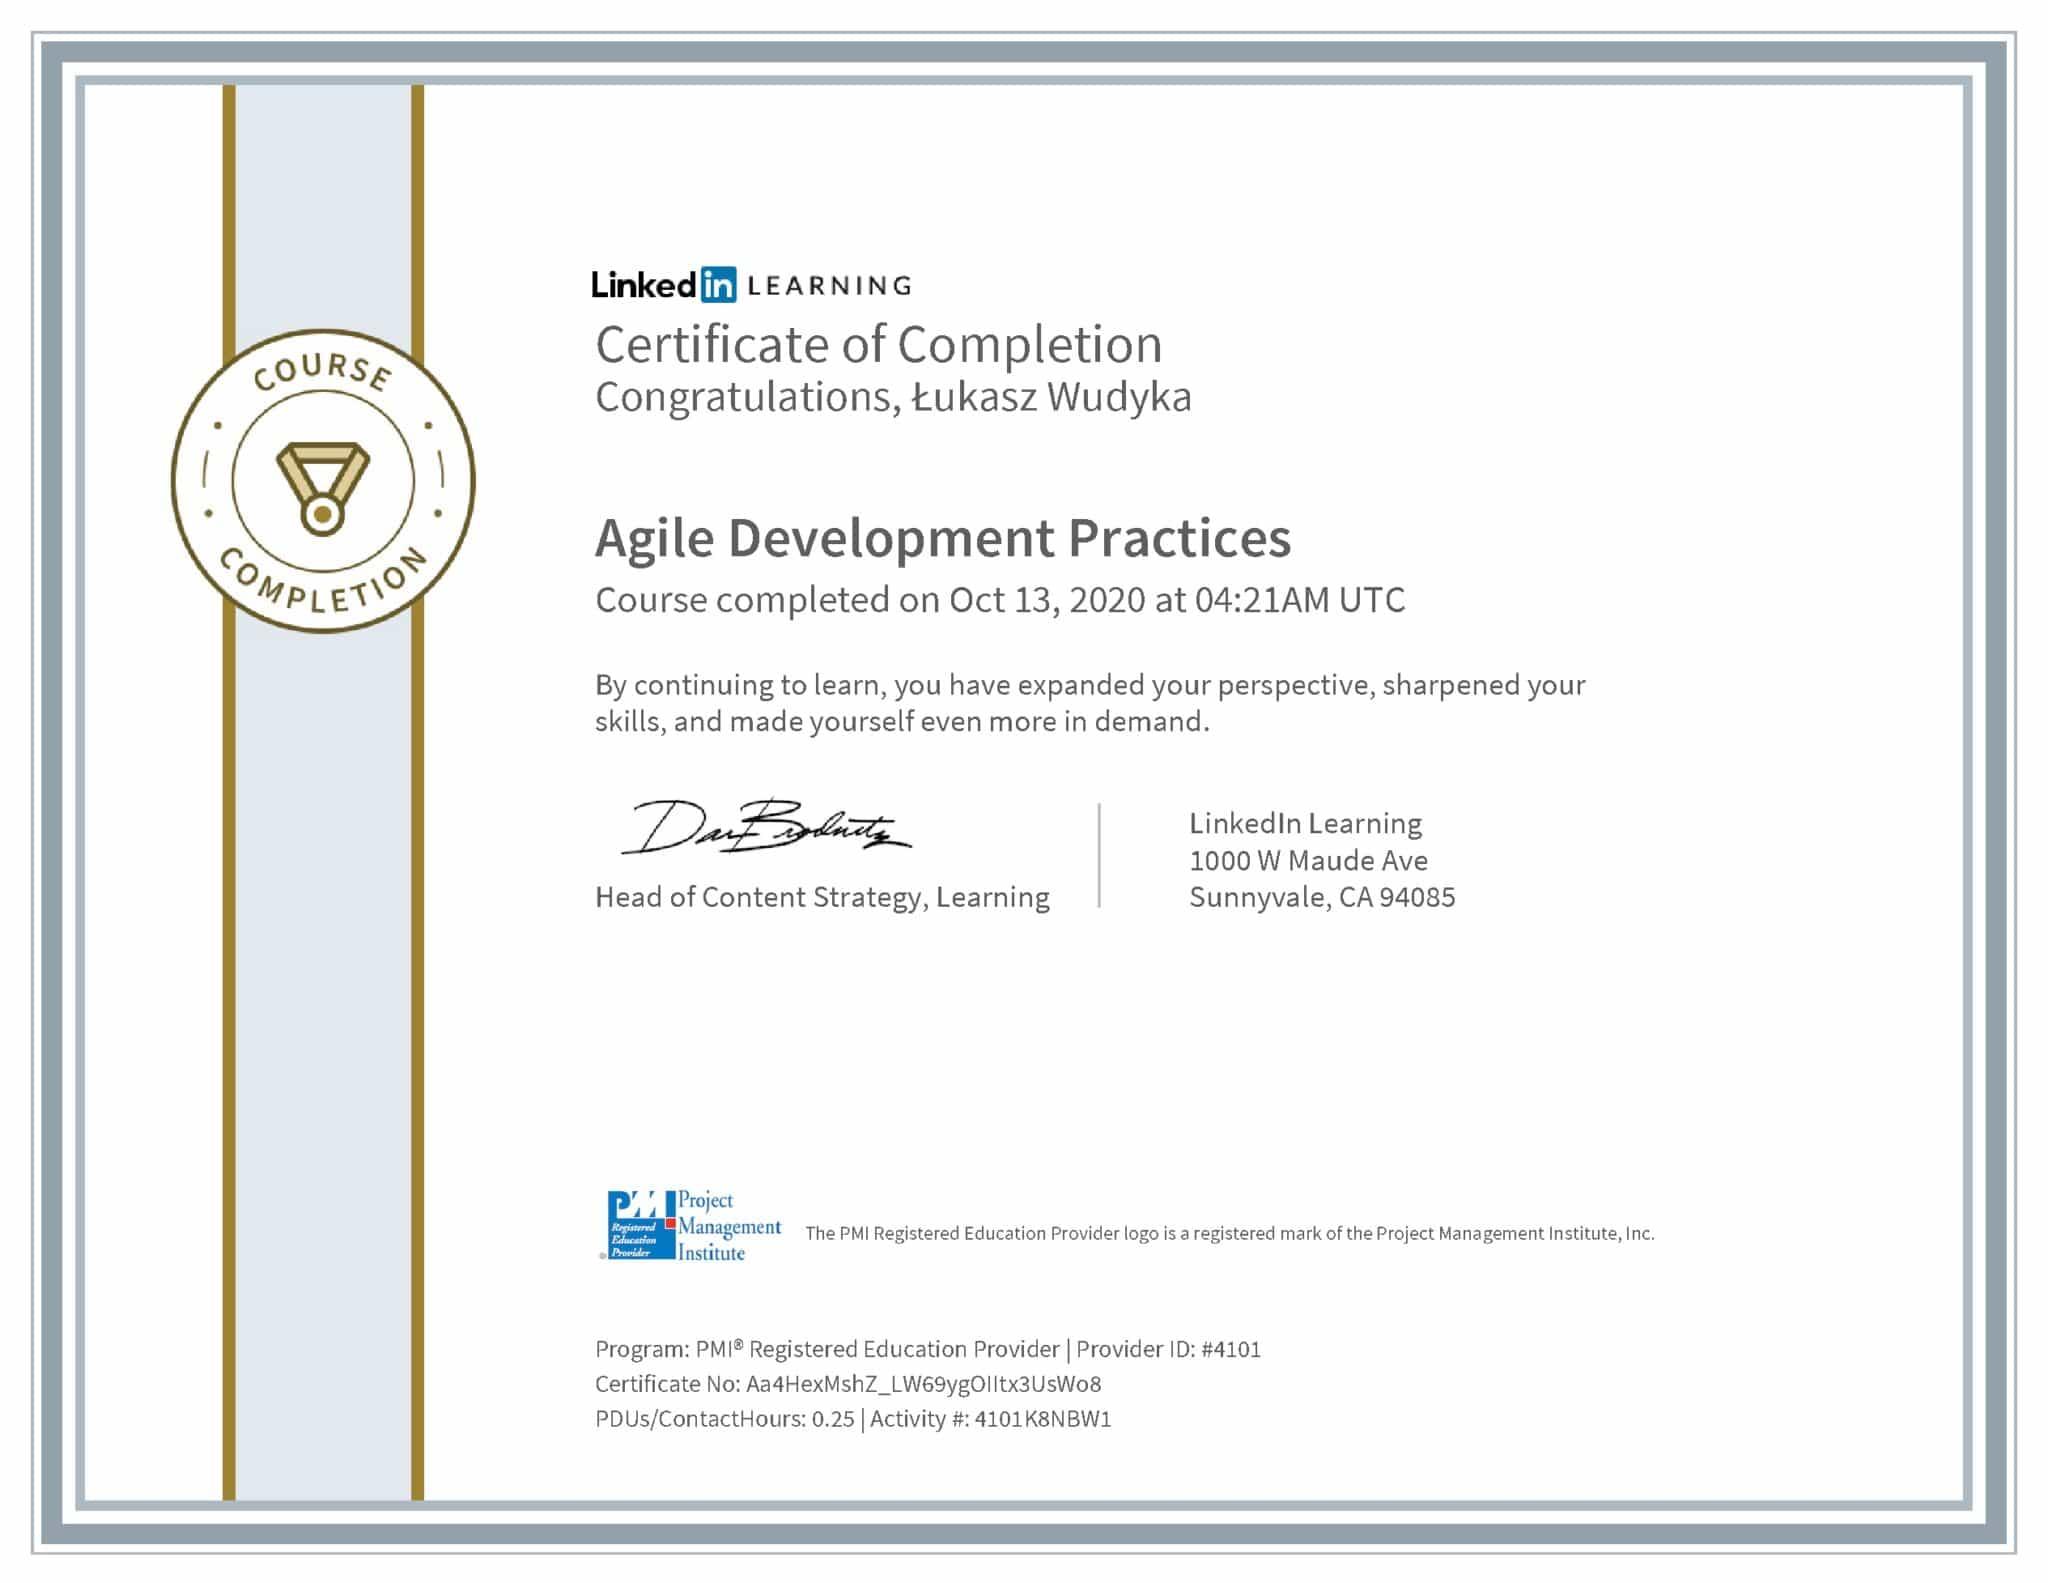 Łukasz Wudyka certyfikat LinkedIn Agile Development Practices PMI